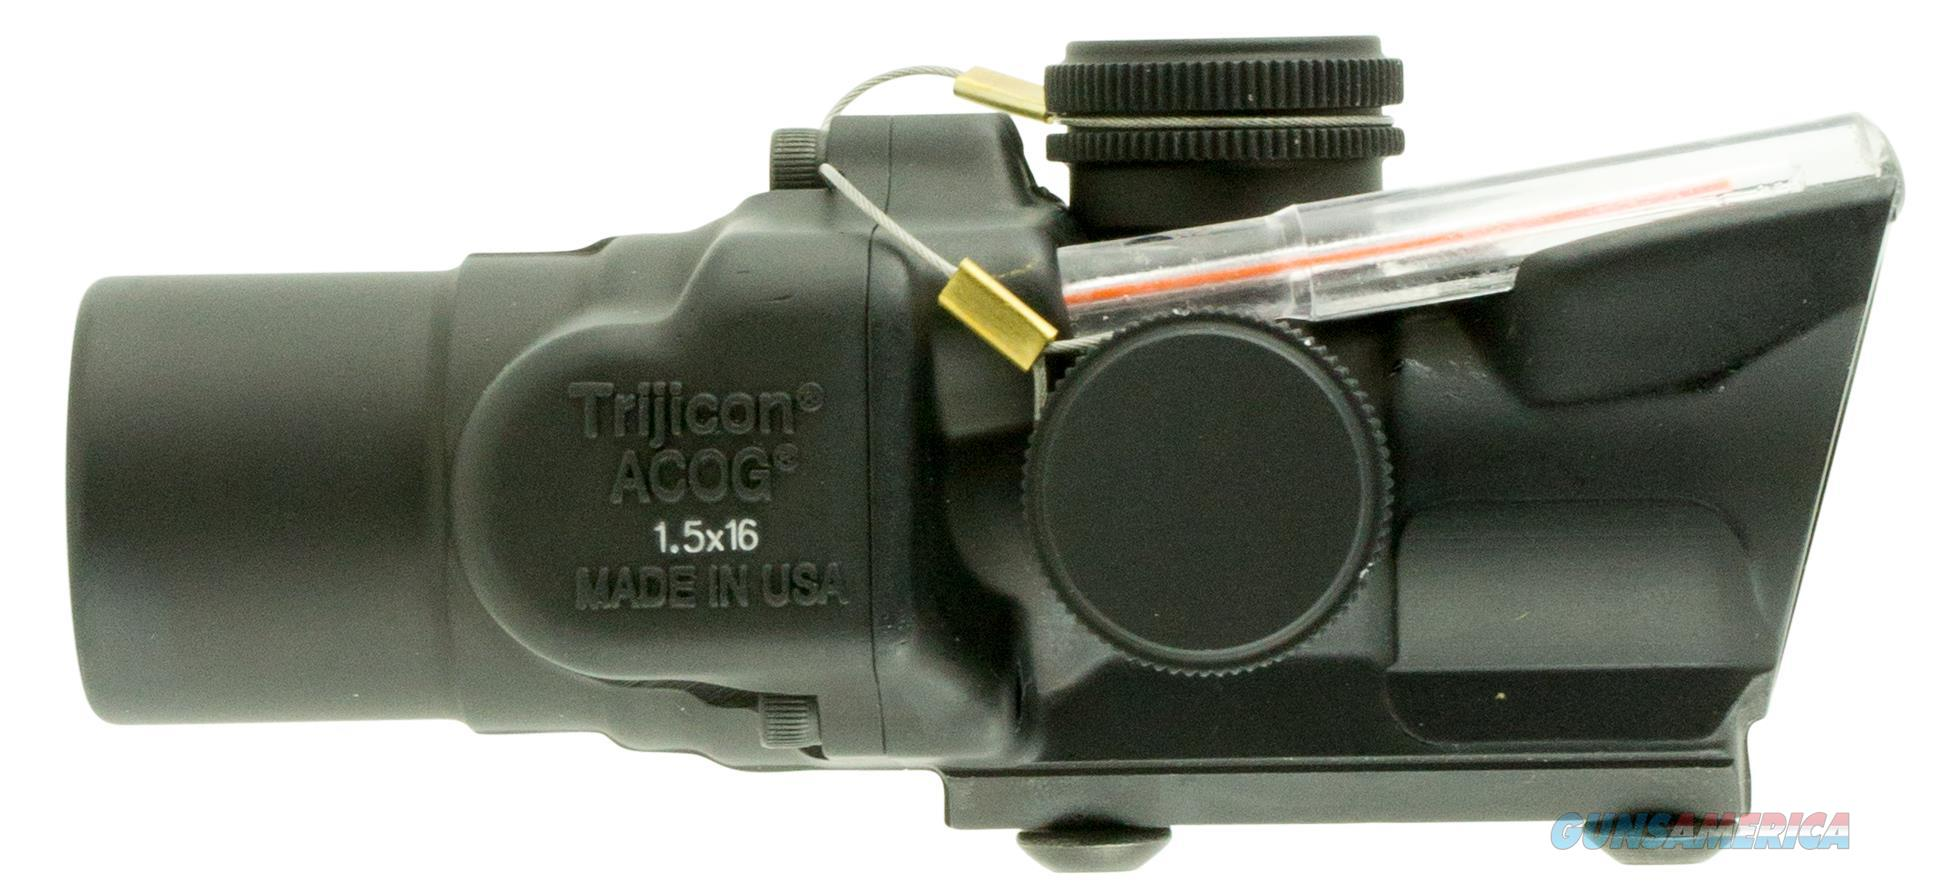 Trijicon 400241 Acog 1.5X 16Mm Obj 39 Ft @ 100 Yds Fov Black Dual Illuminated Ring 2 Moa Dot Red 400241  Non-Guns > Iron/Metal/Peep Sights